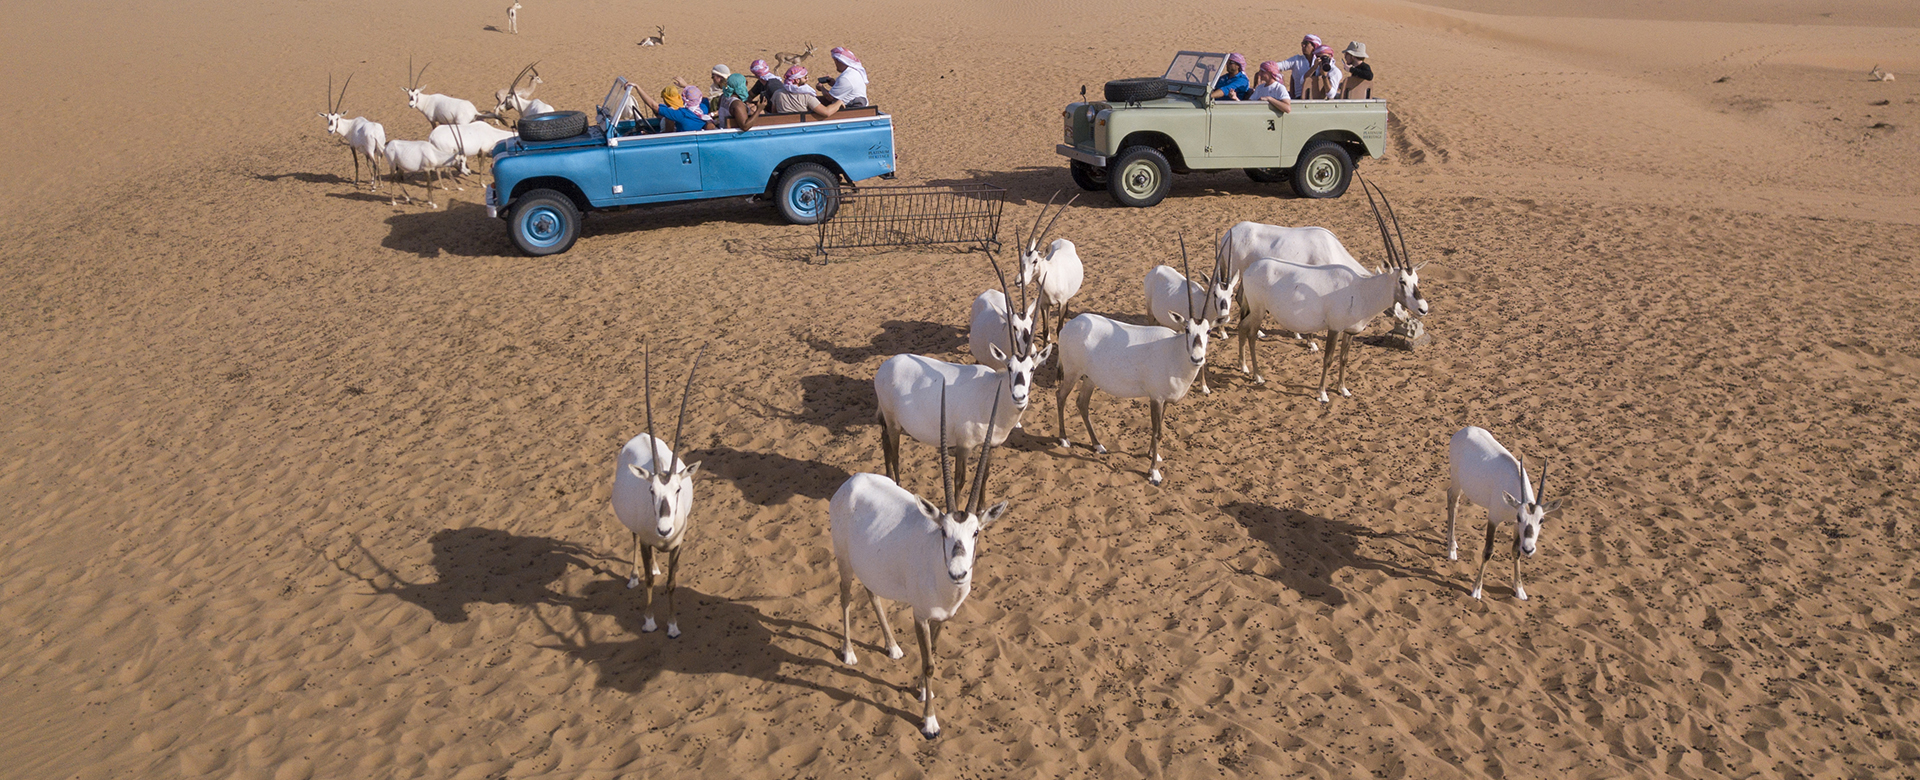 VIntage Land Rovers Dubai Desert Conservations Reserve